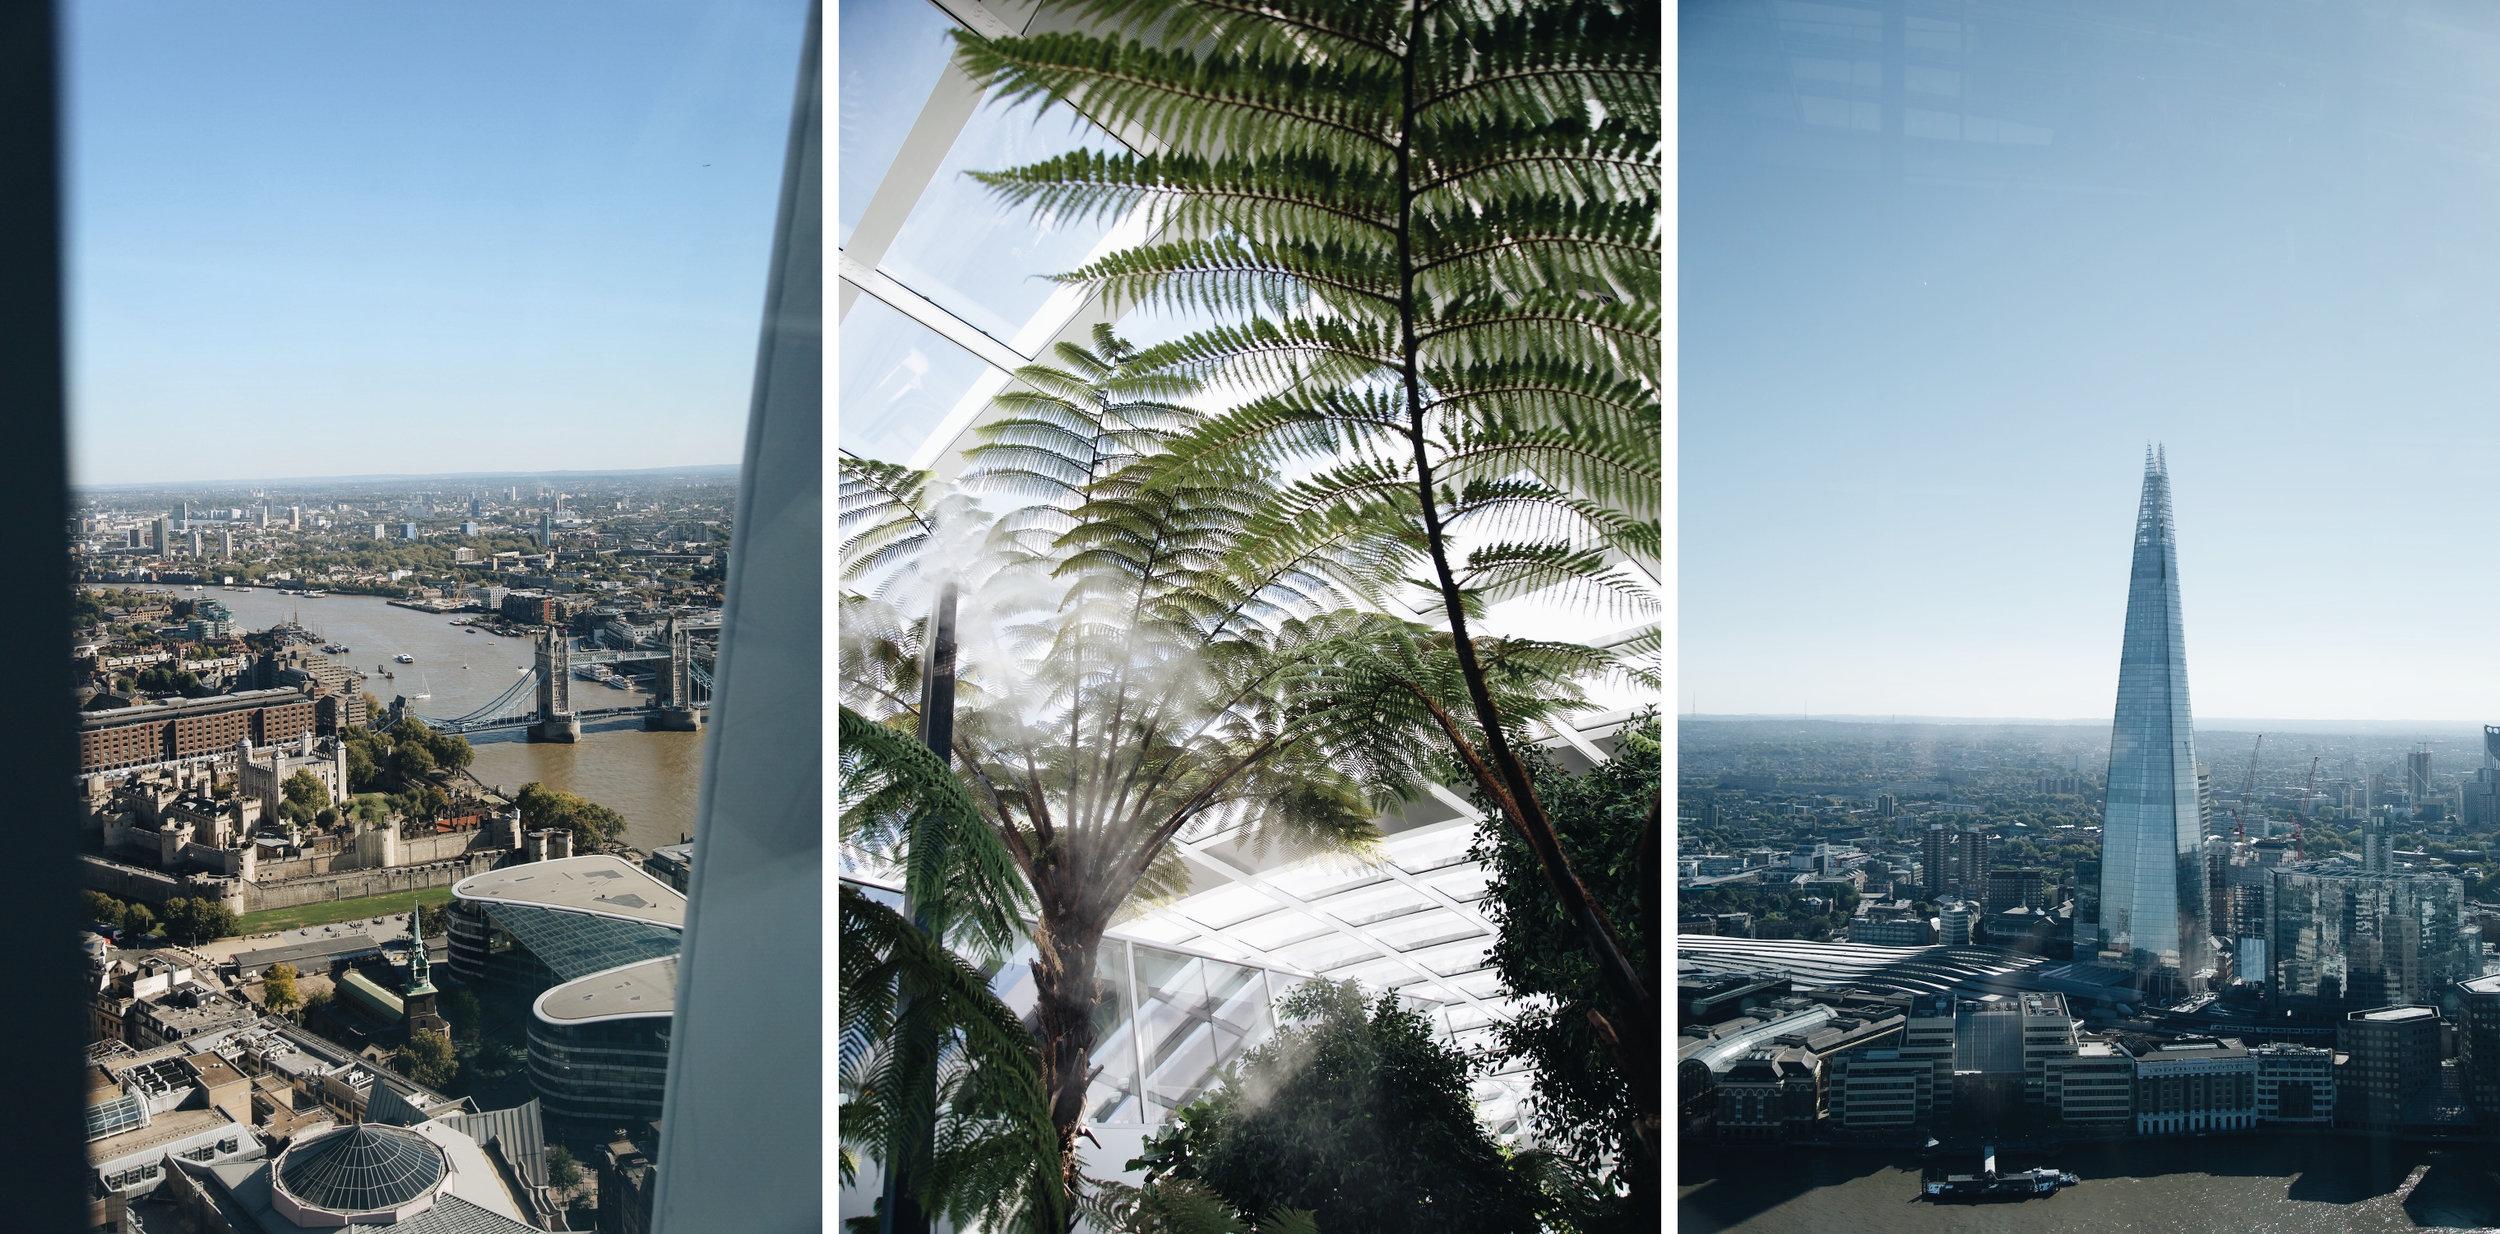 sky-garden-londres-visite-que-faire-week-end.jpg